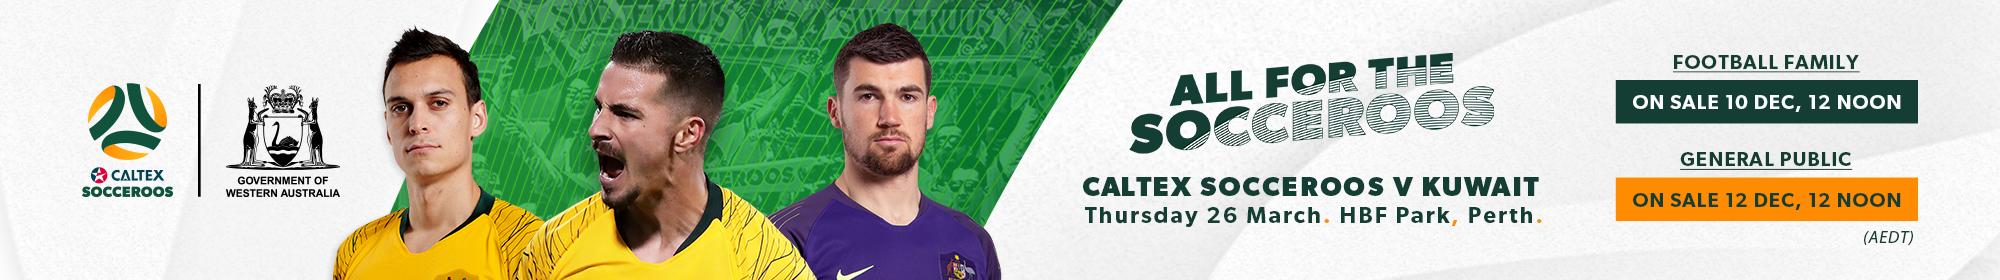 Caltex Socceroos v Kuwait ticket banner